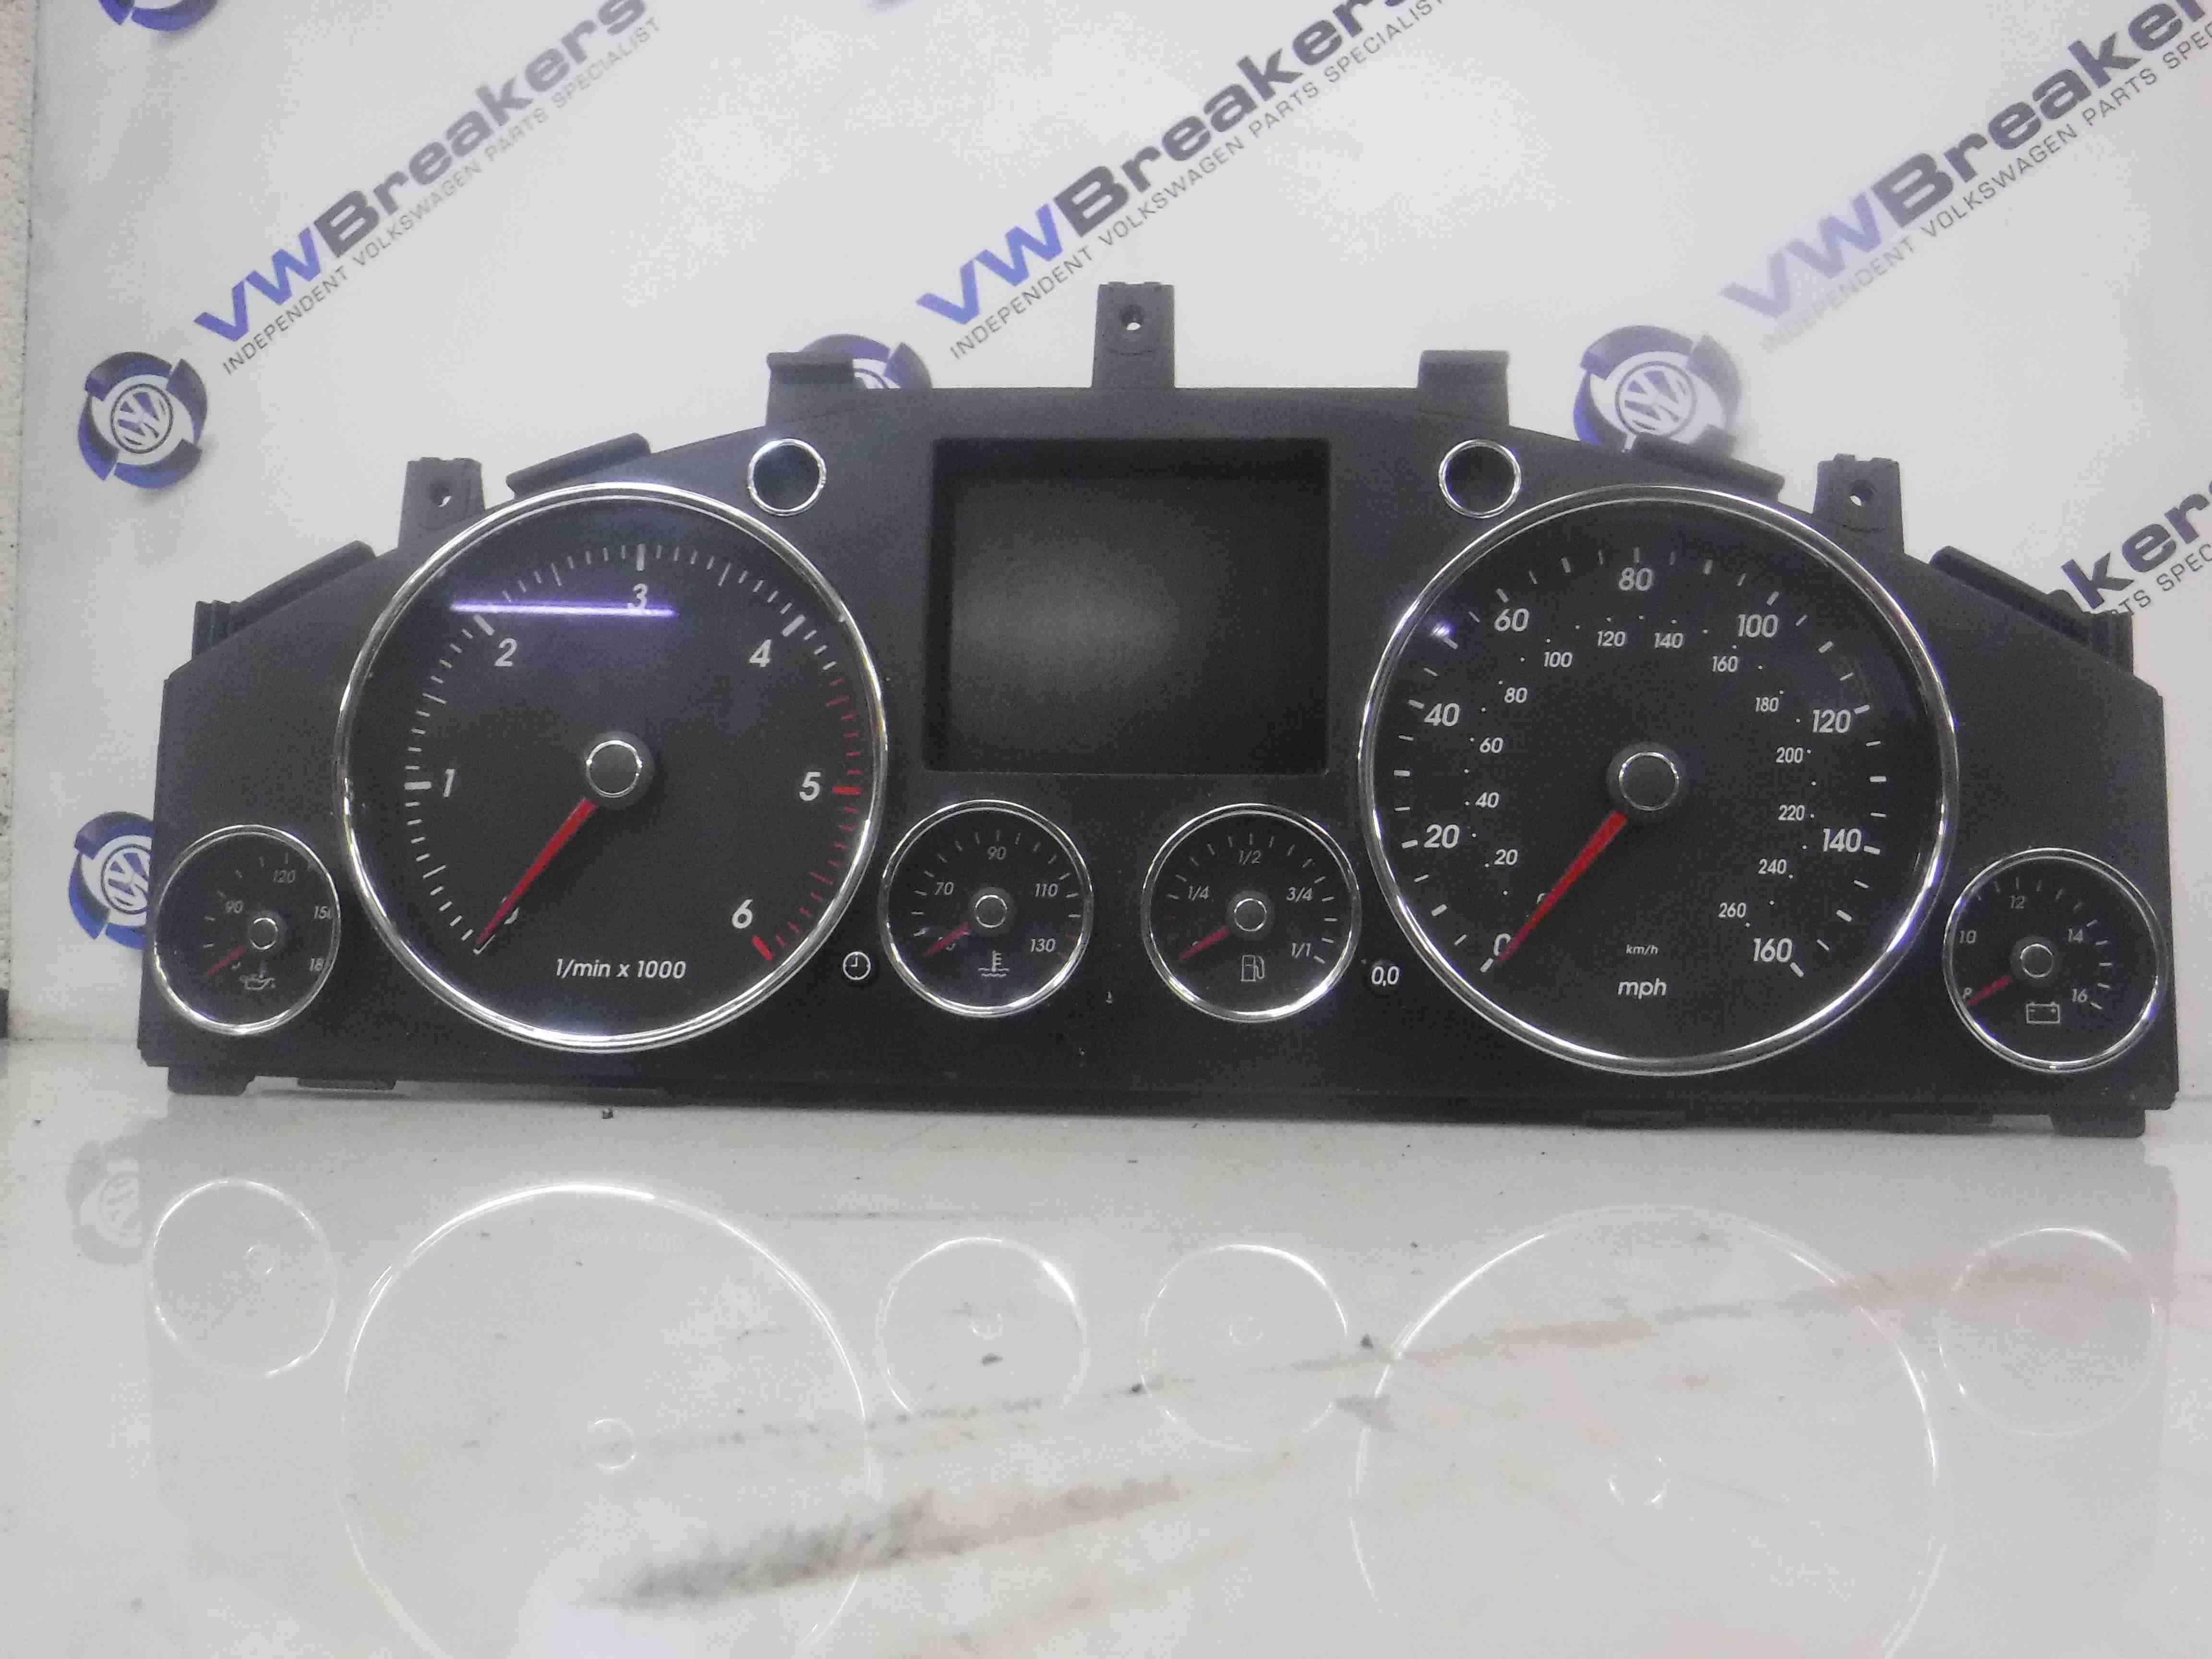 Volkswagen Touareg 2002-2007 Instrument Panel Clocks Dials Cluster Automatic